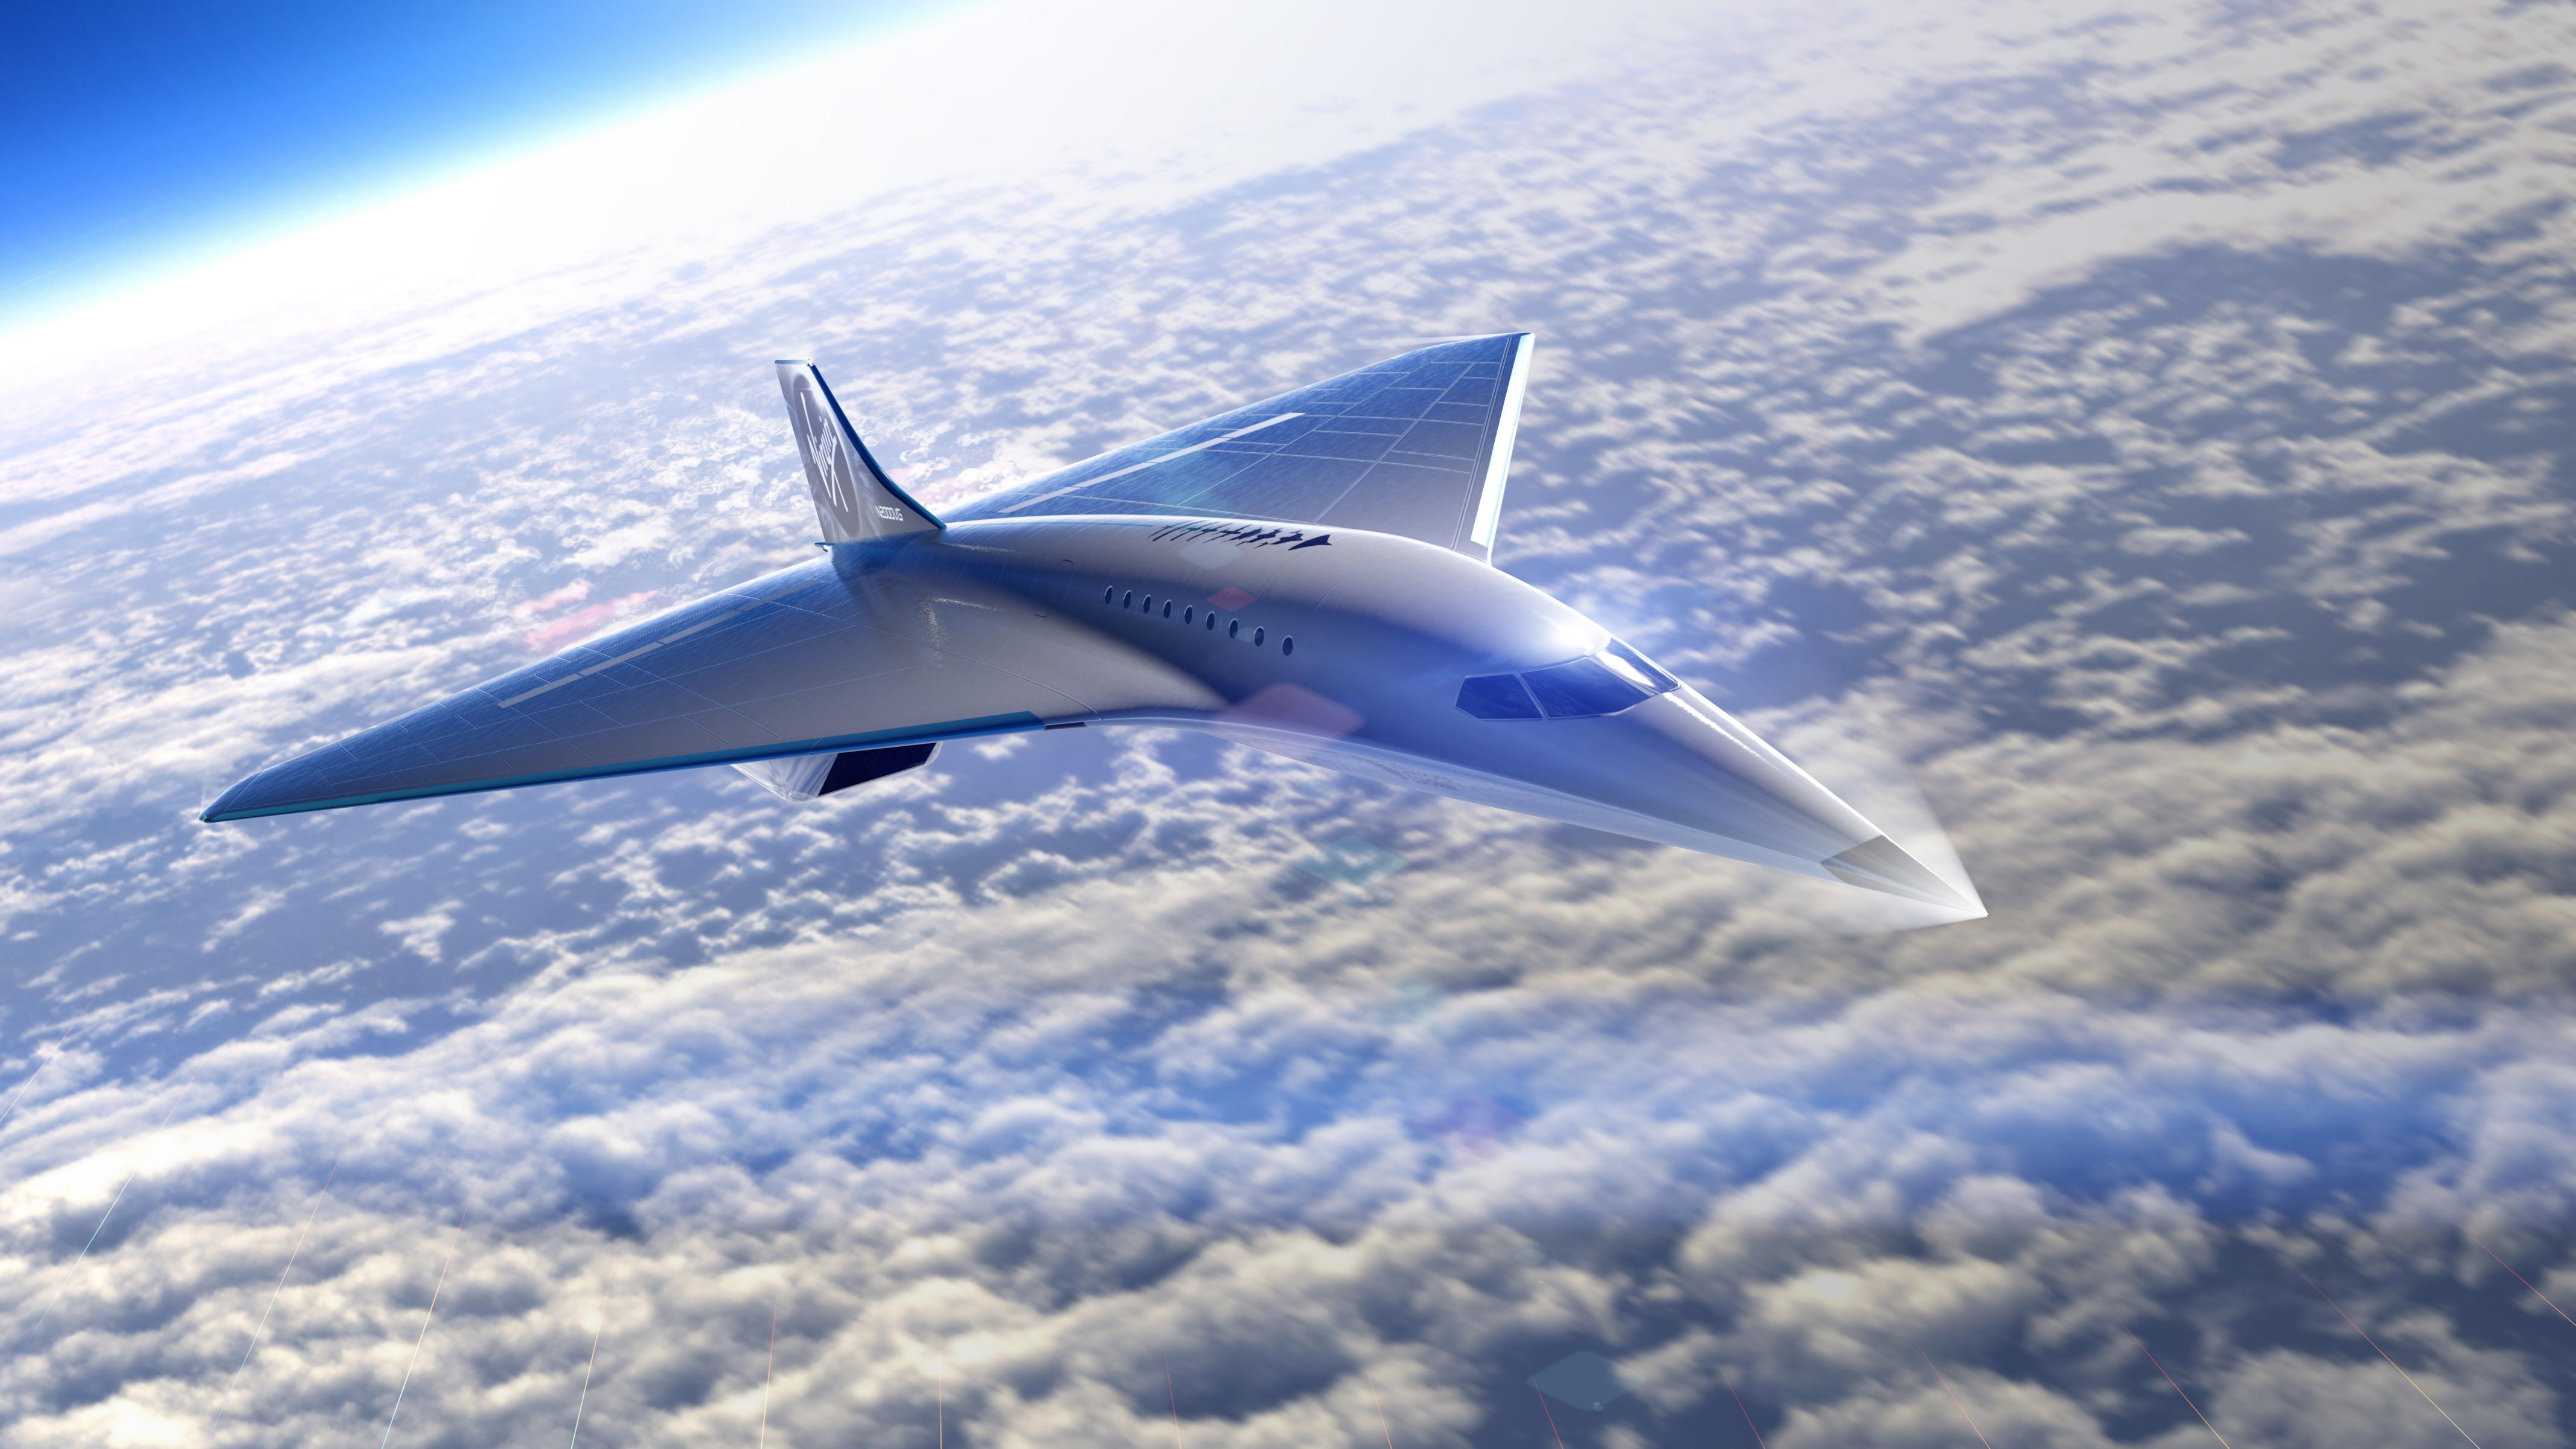 The concept has a delta-wing design